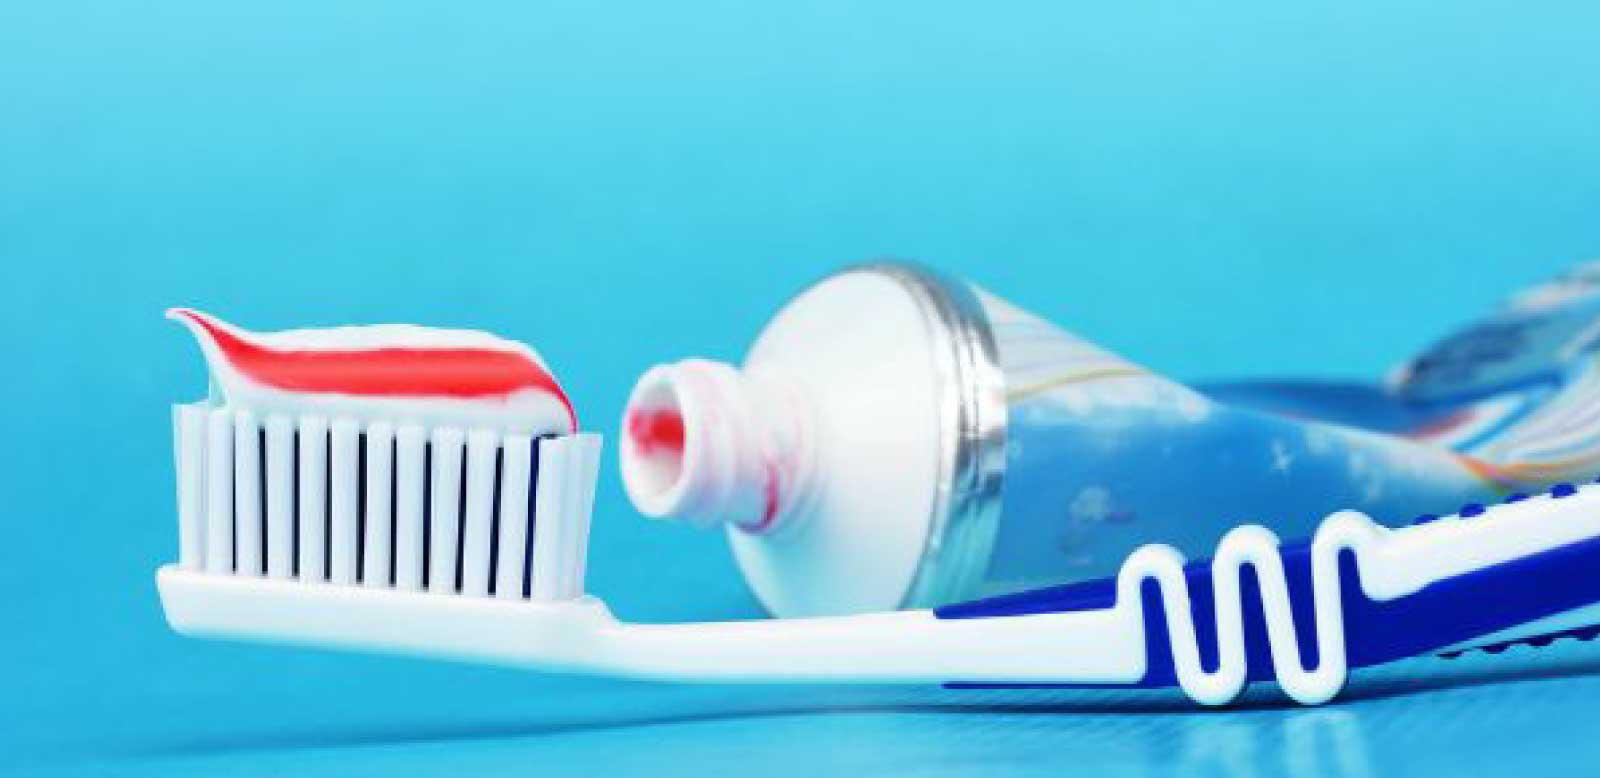 टूथपेस्ट प्रेग्नेंसी टेस्ट (toothpaste pregnancy test in hindi)